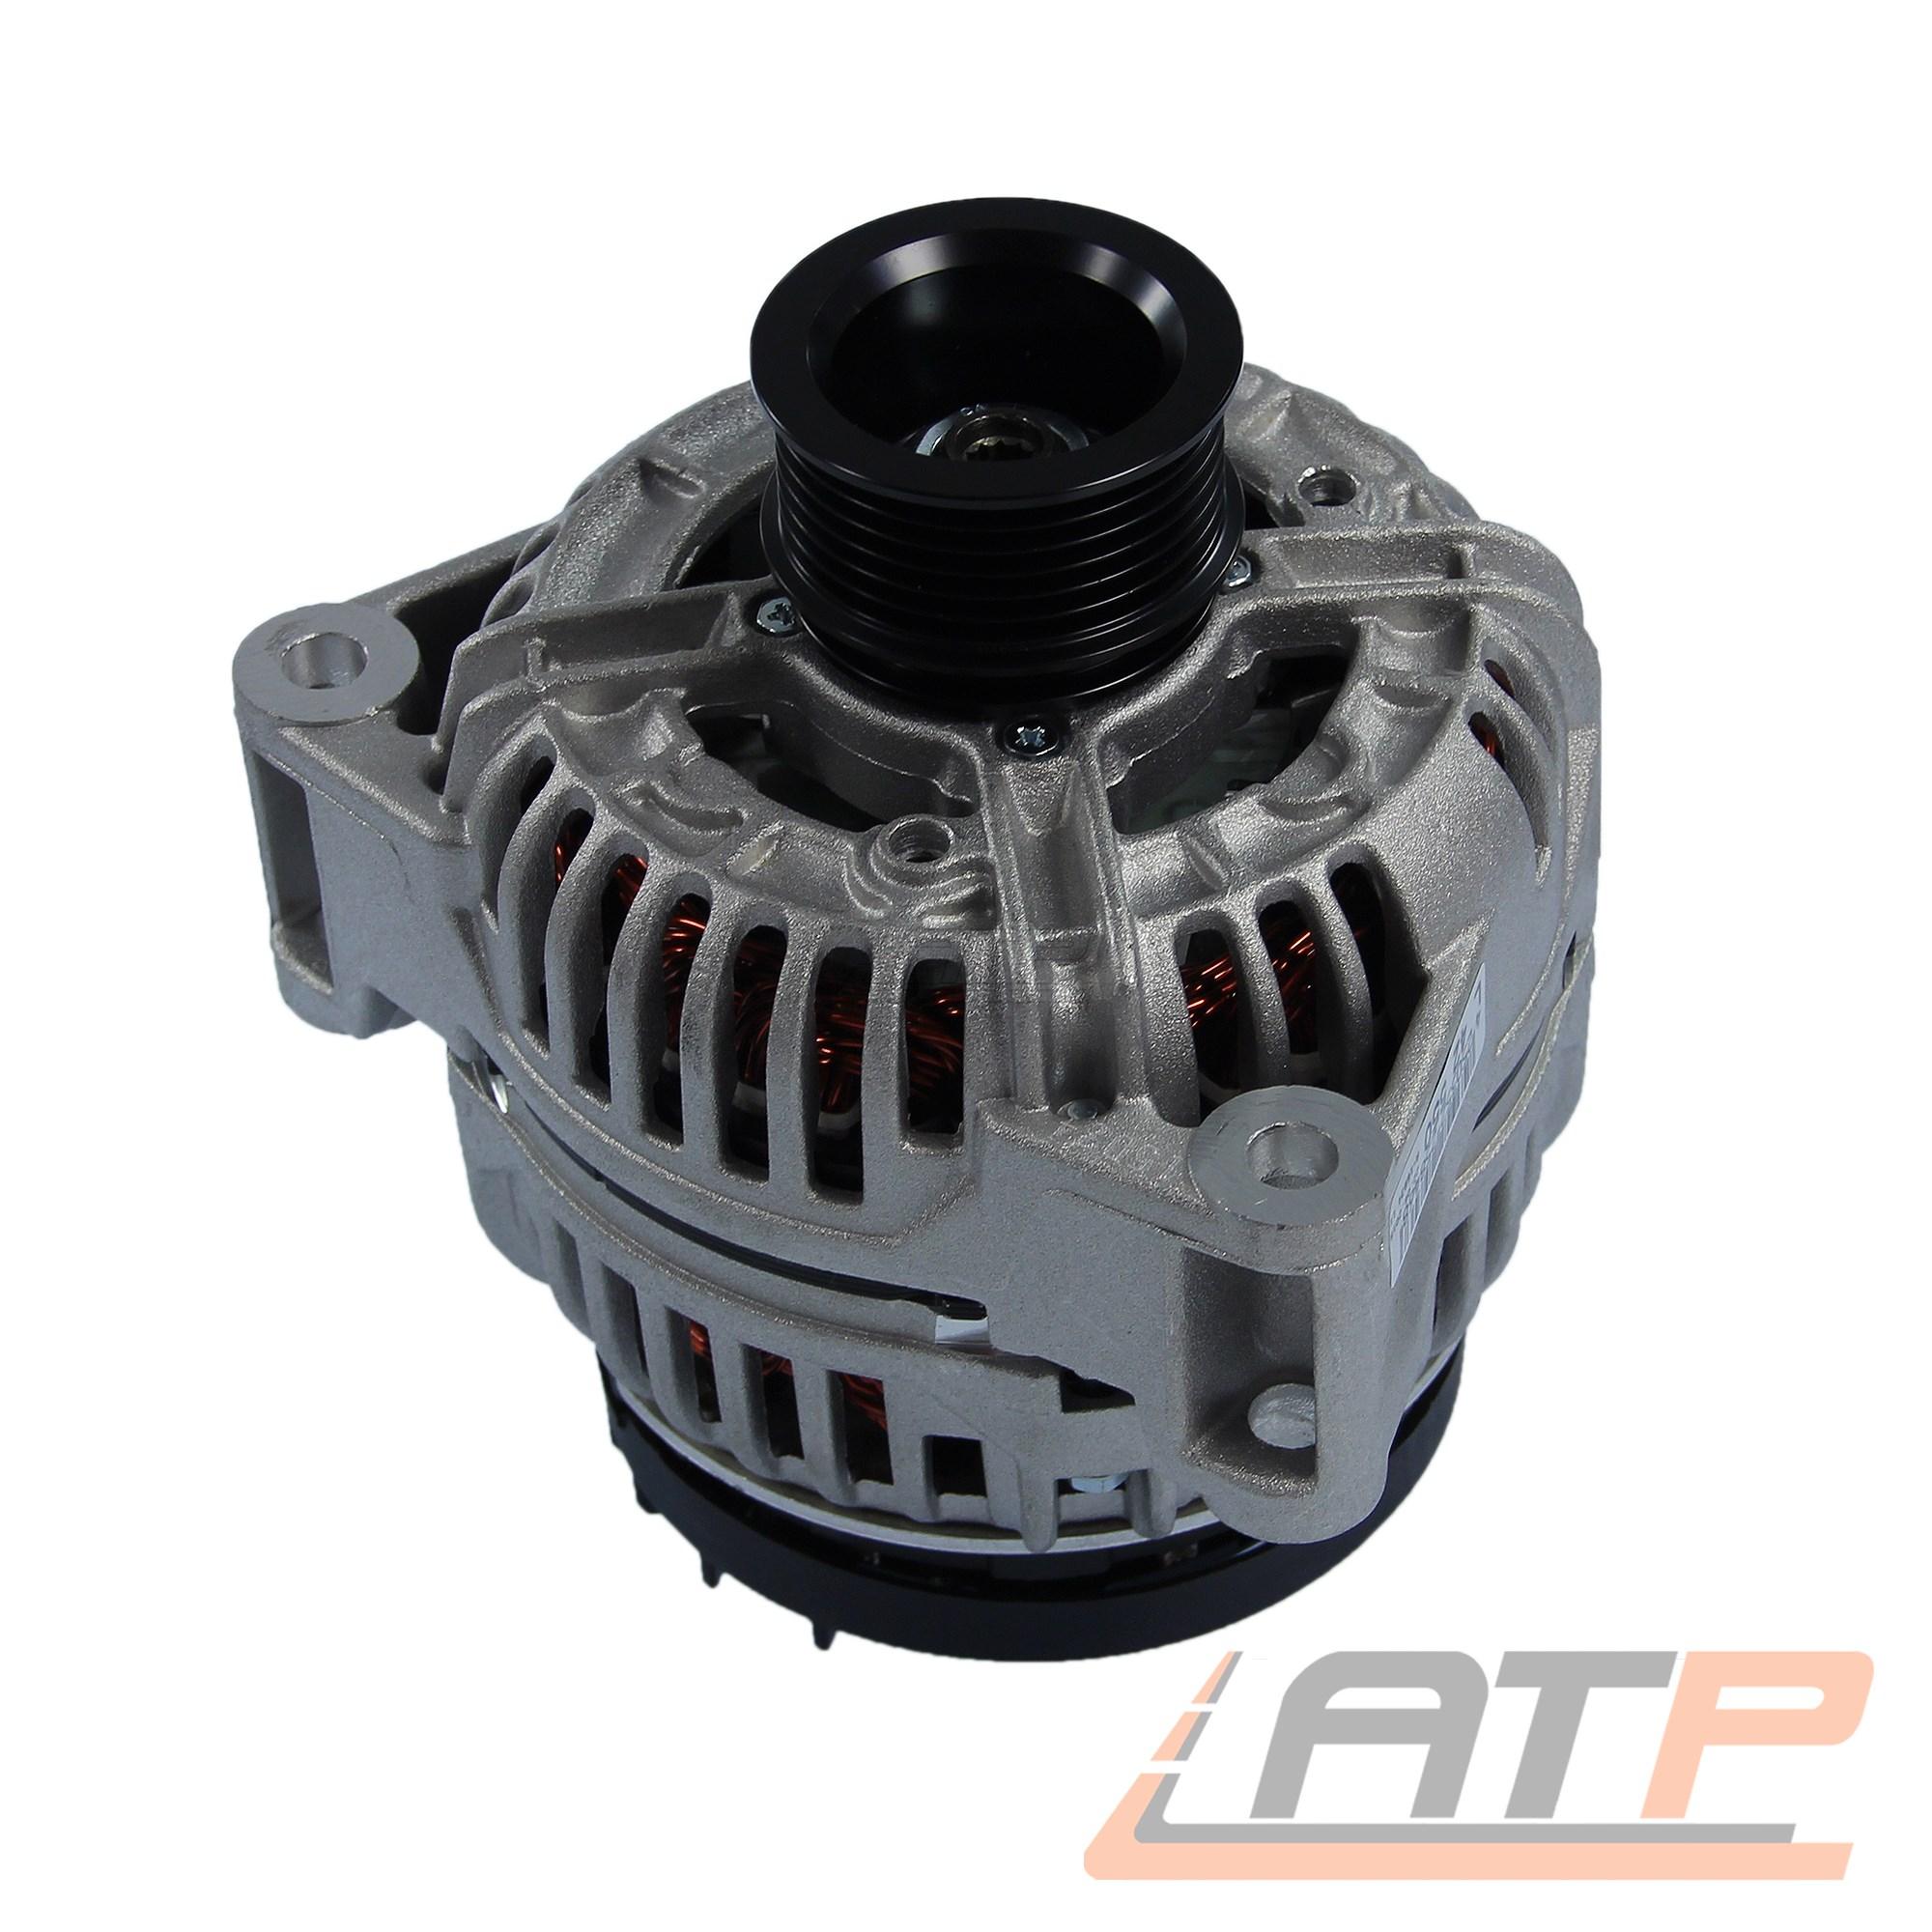 LICHTMASCHINE GENERATOR 120-A MERCEDES BENZ SLK R171 200 Kompressor